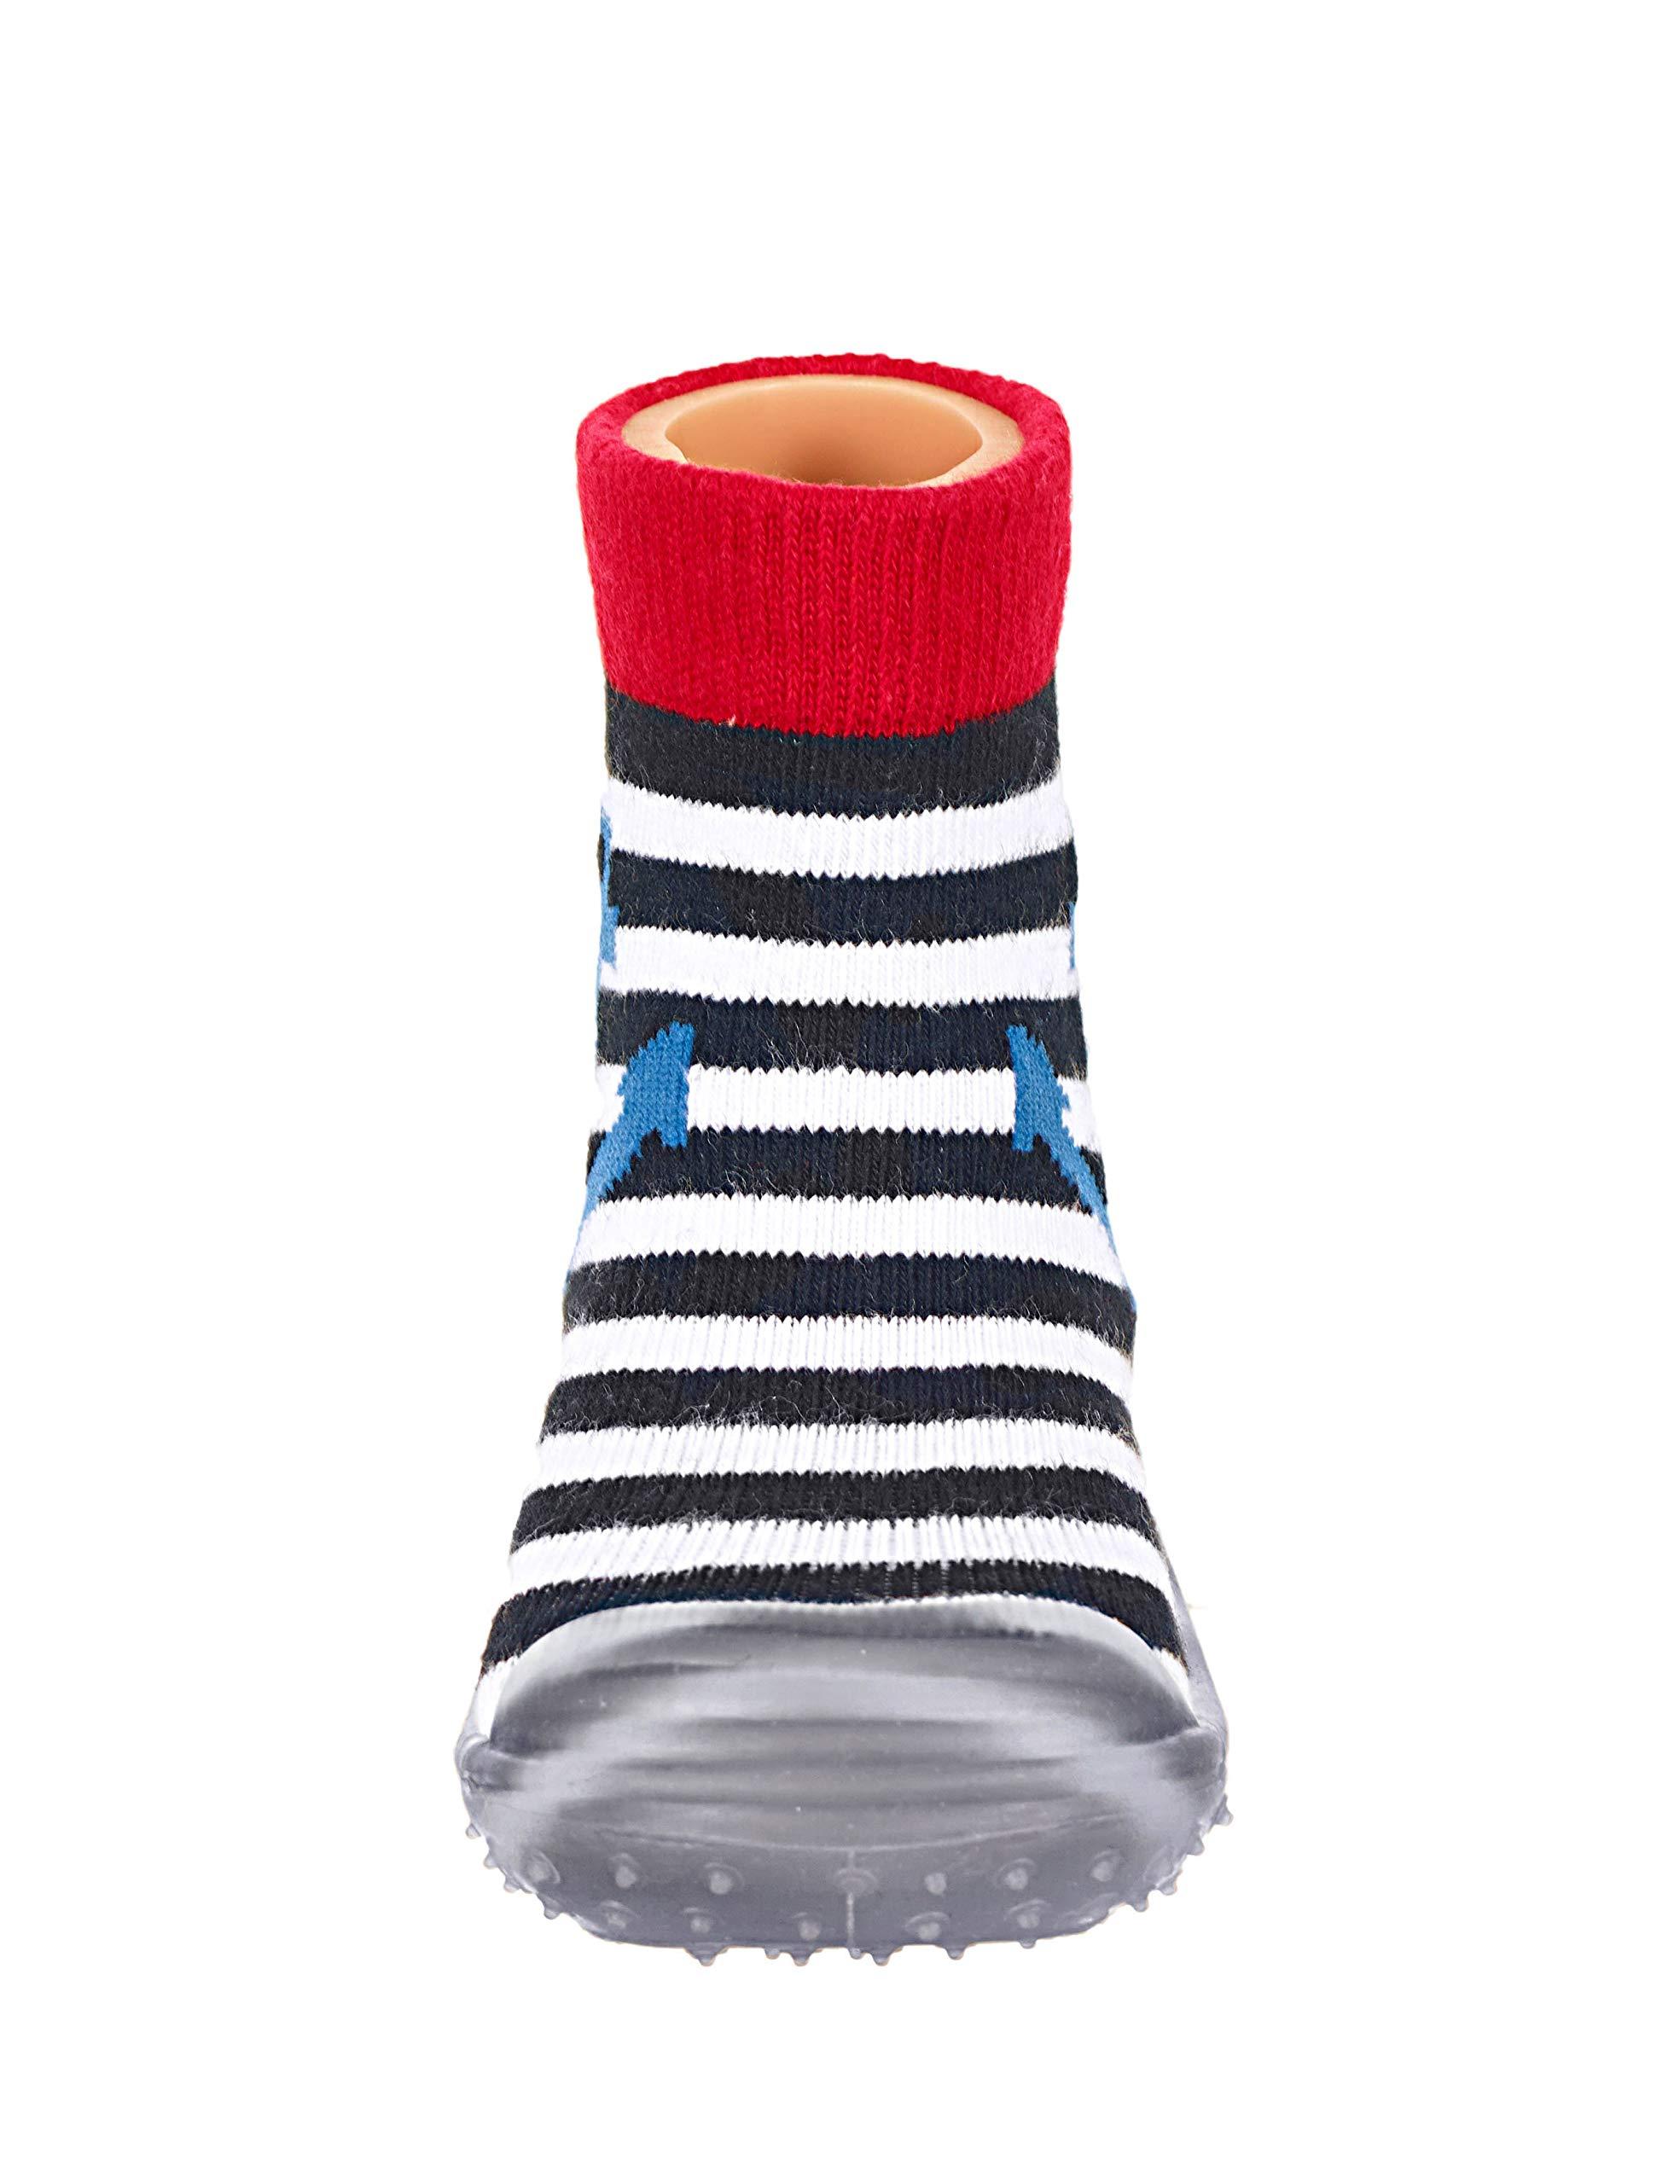 Sterntaler Adventure-Socks Anker, Zapatillas Impermeables para Niños 4